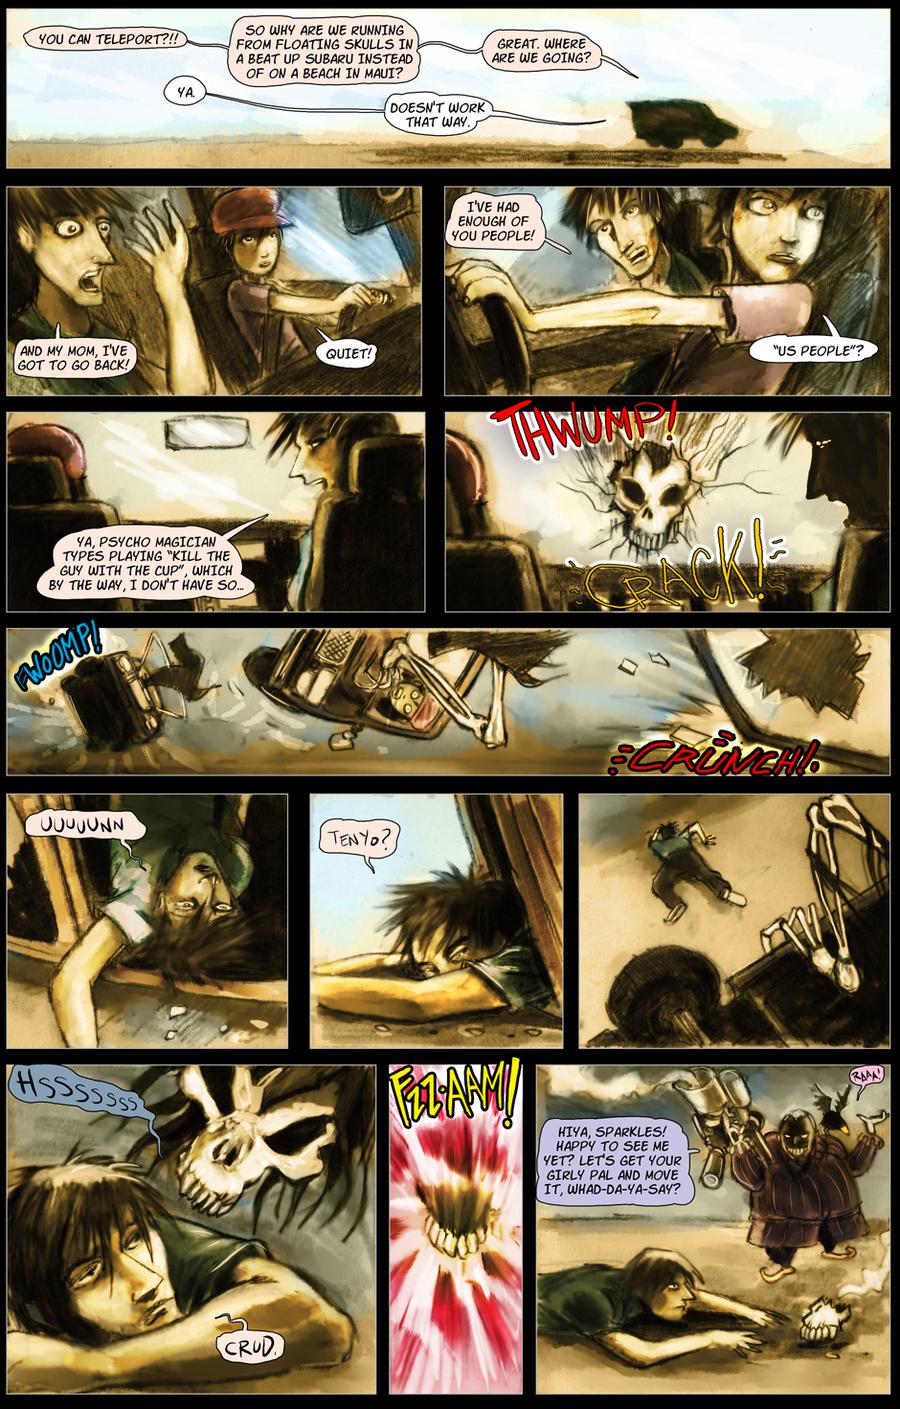 The Conjurers for Jun 23, 2014 Comic Strip